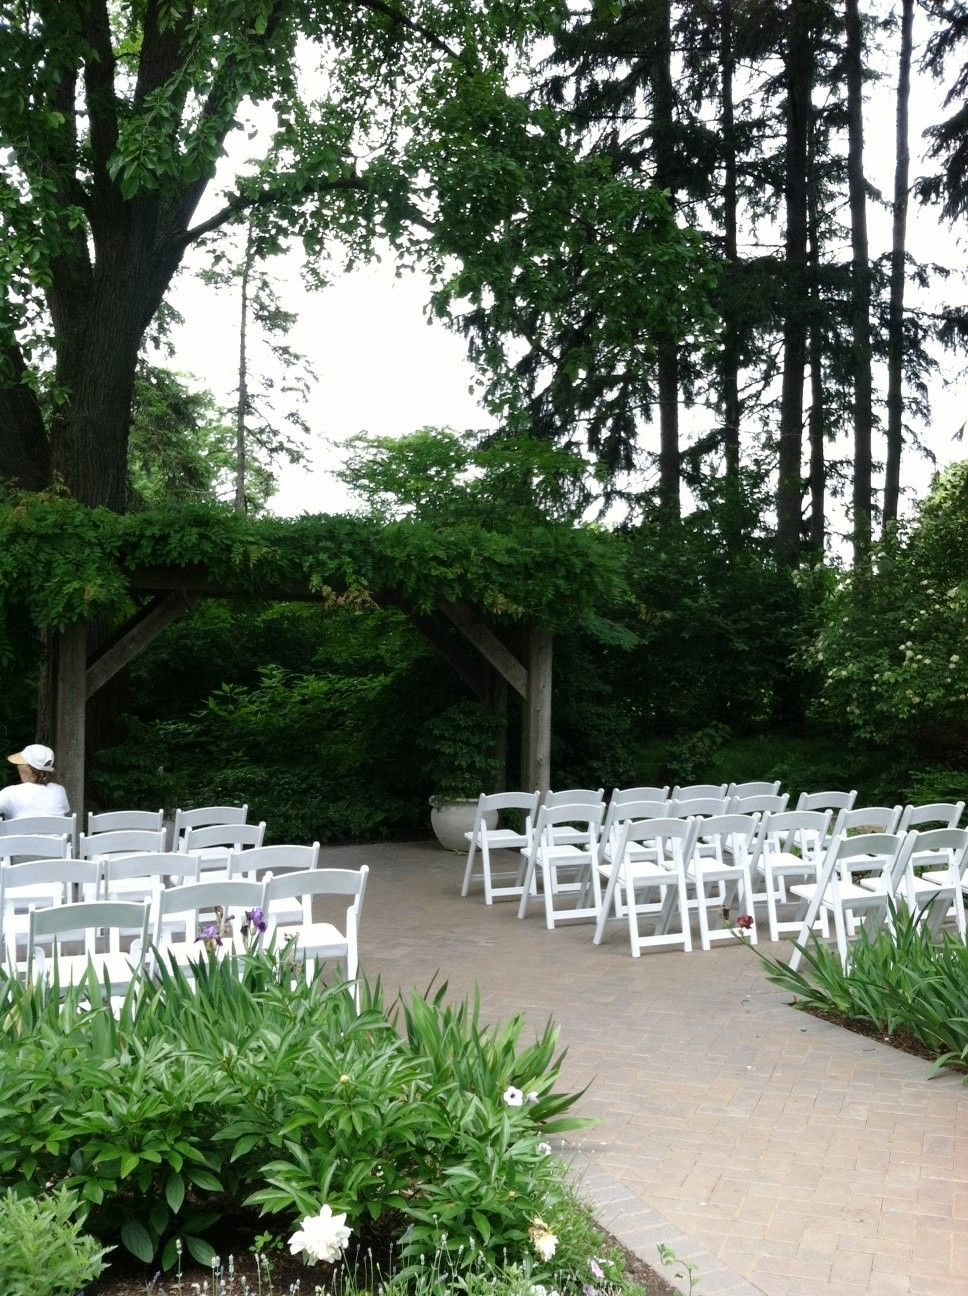 15 Best Outdoor Wedding Venues in Chicago Chitown Brides